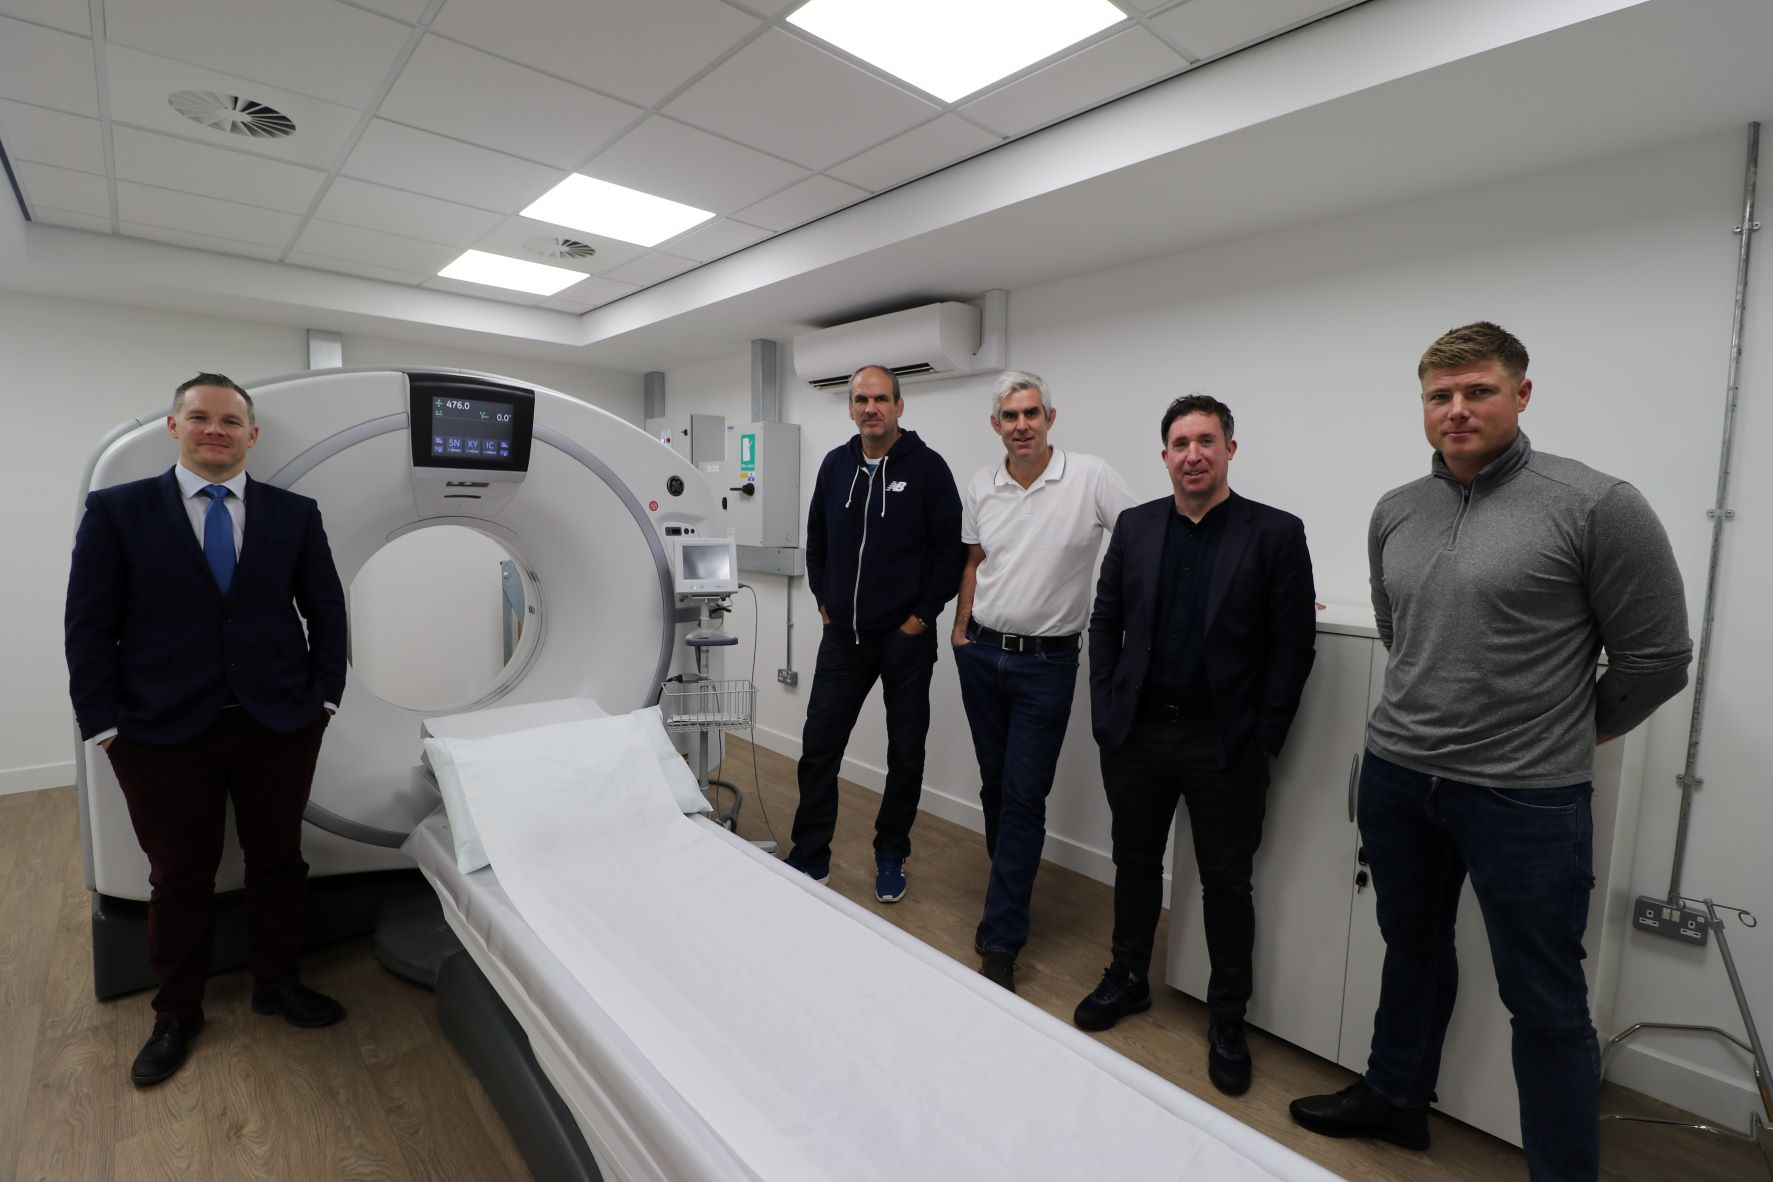 Sporting legends undergo cutting edge heart screening checks on World Heart Day